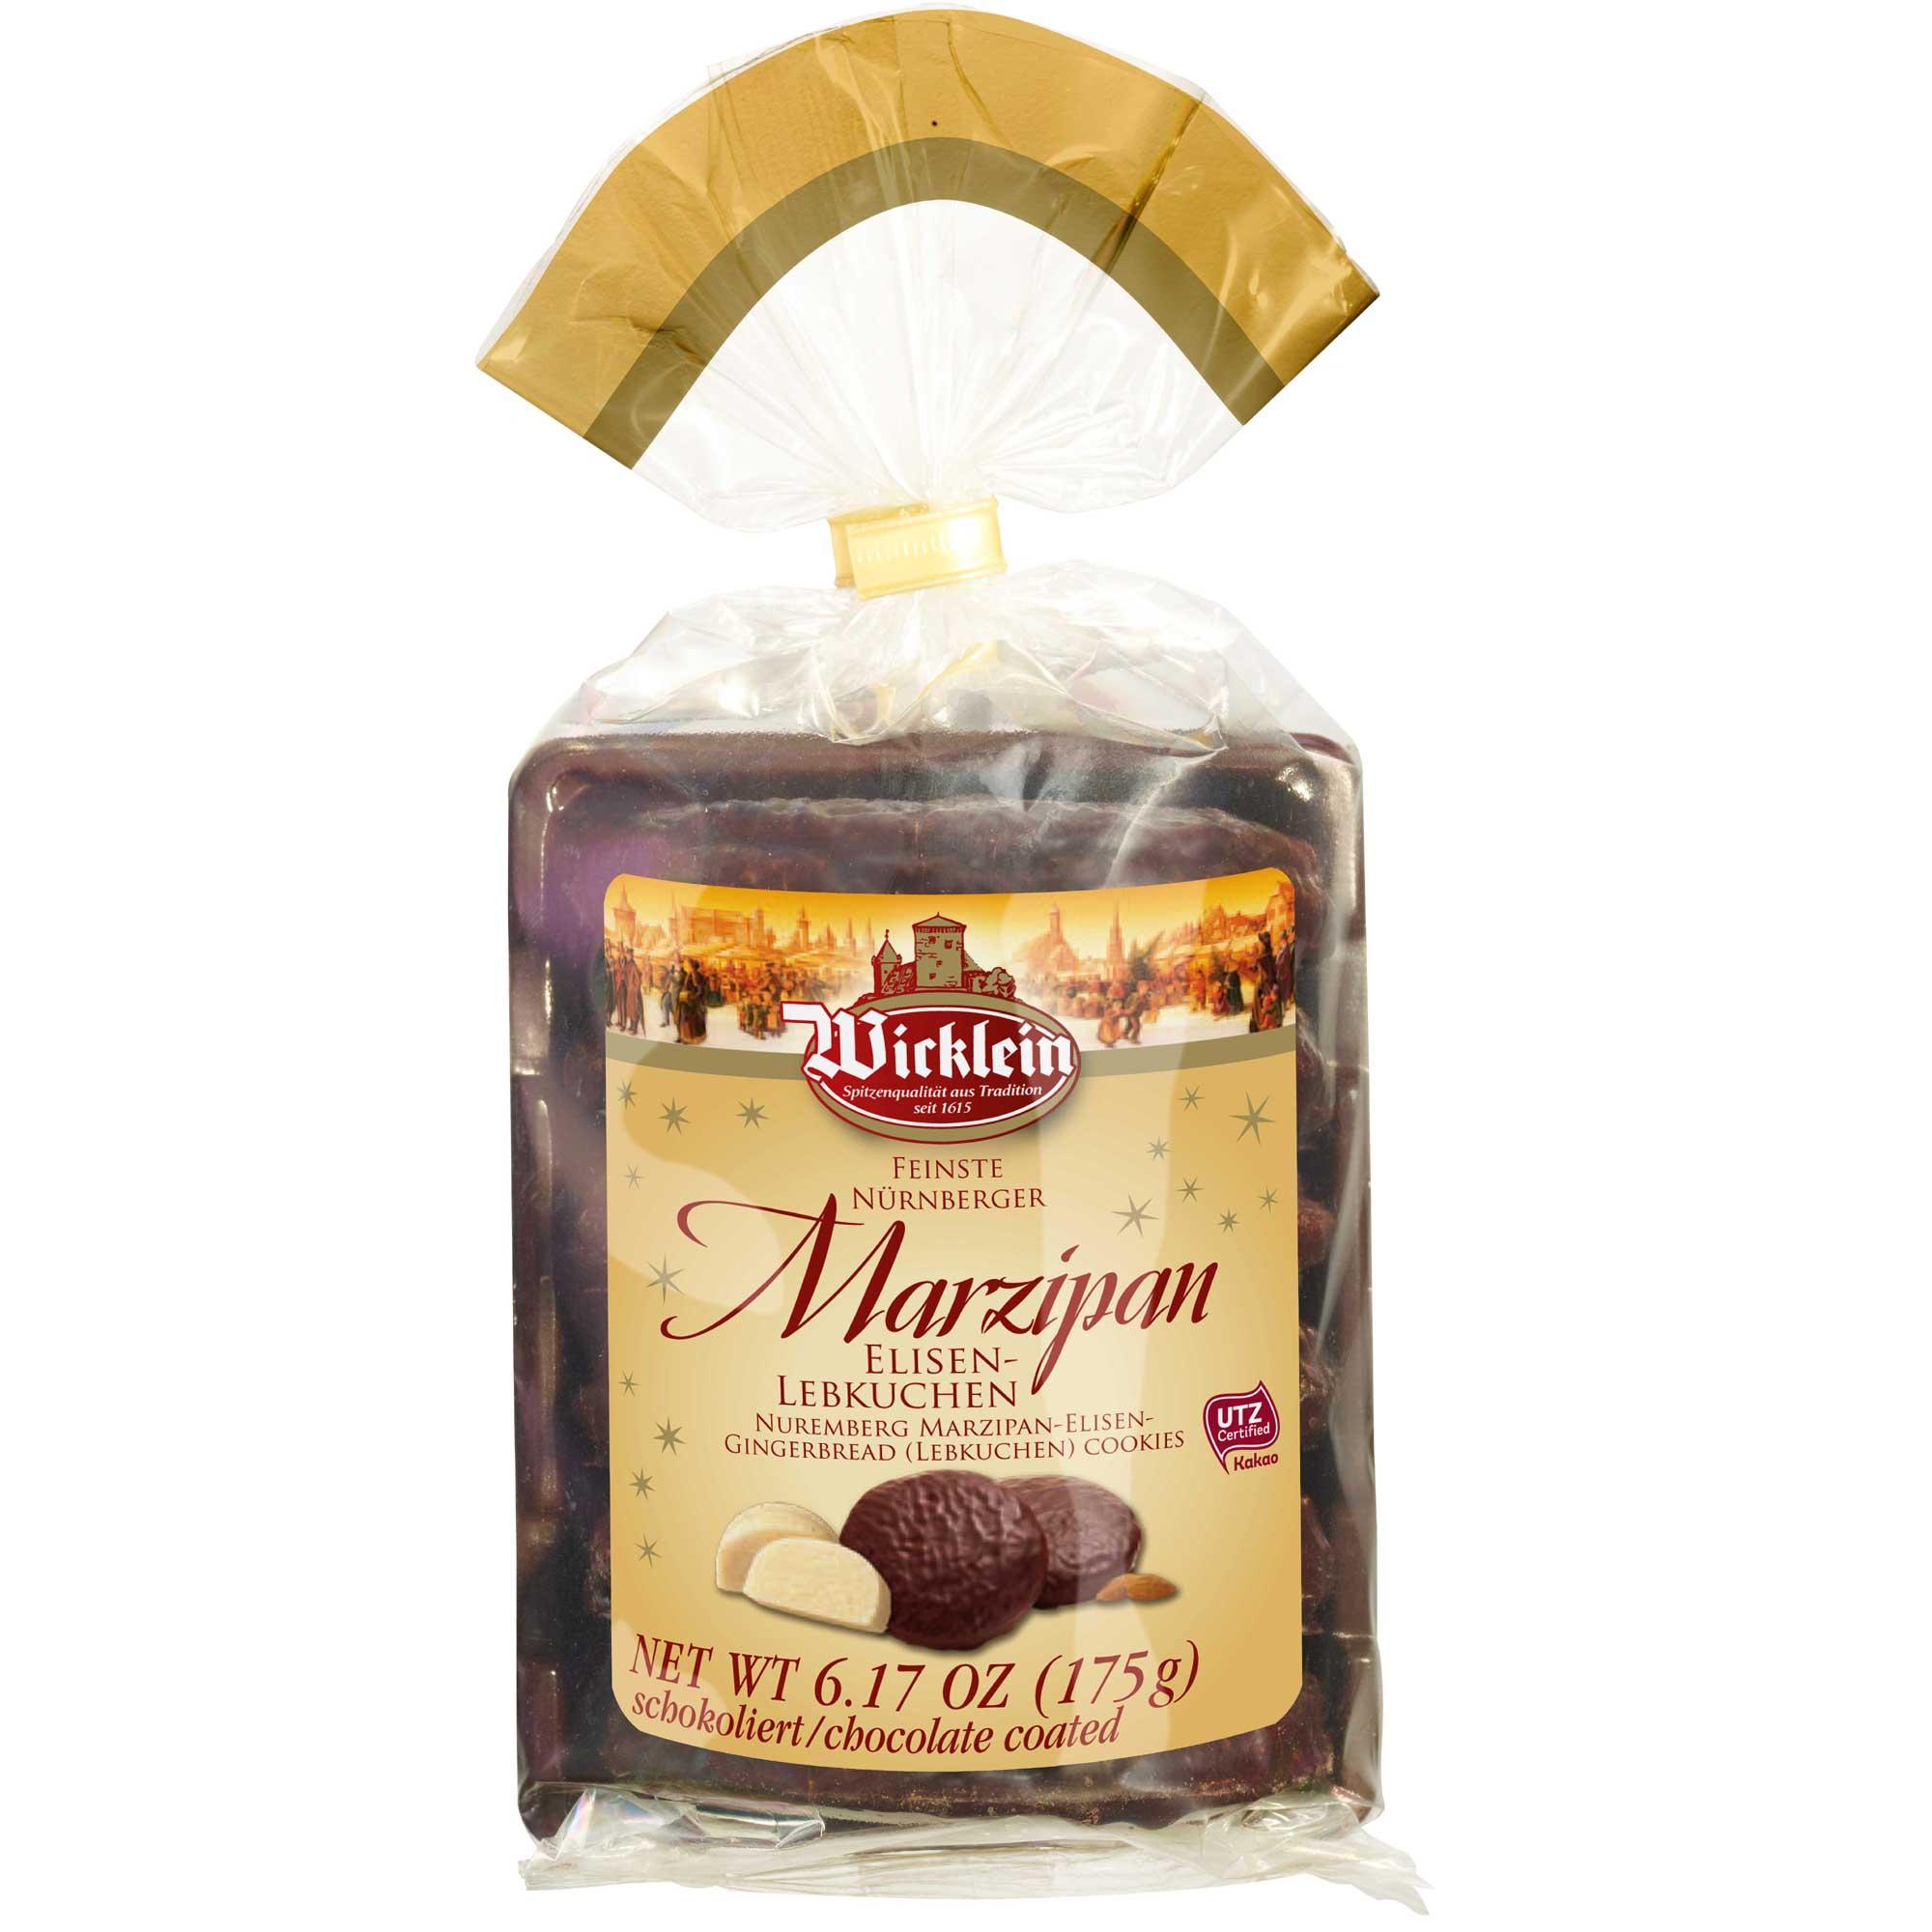 wicklein n rnberger marzipan elisen lebkuchen online kaufen im world of sweets shop. Black Bedroom Furniture Sets. Home Design Ideas